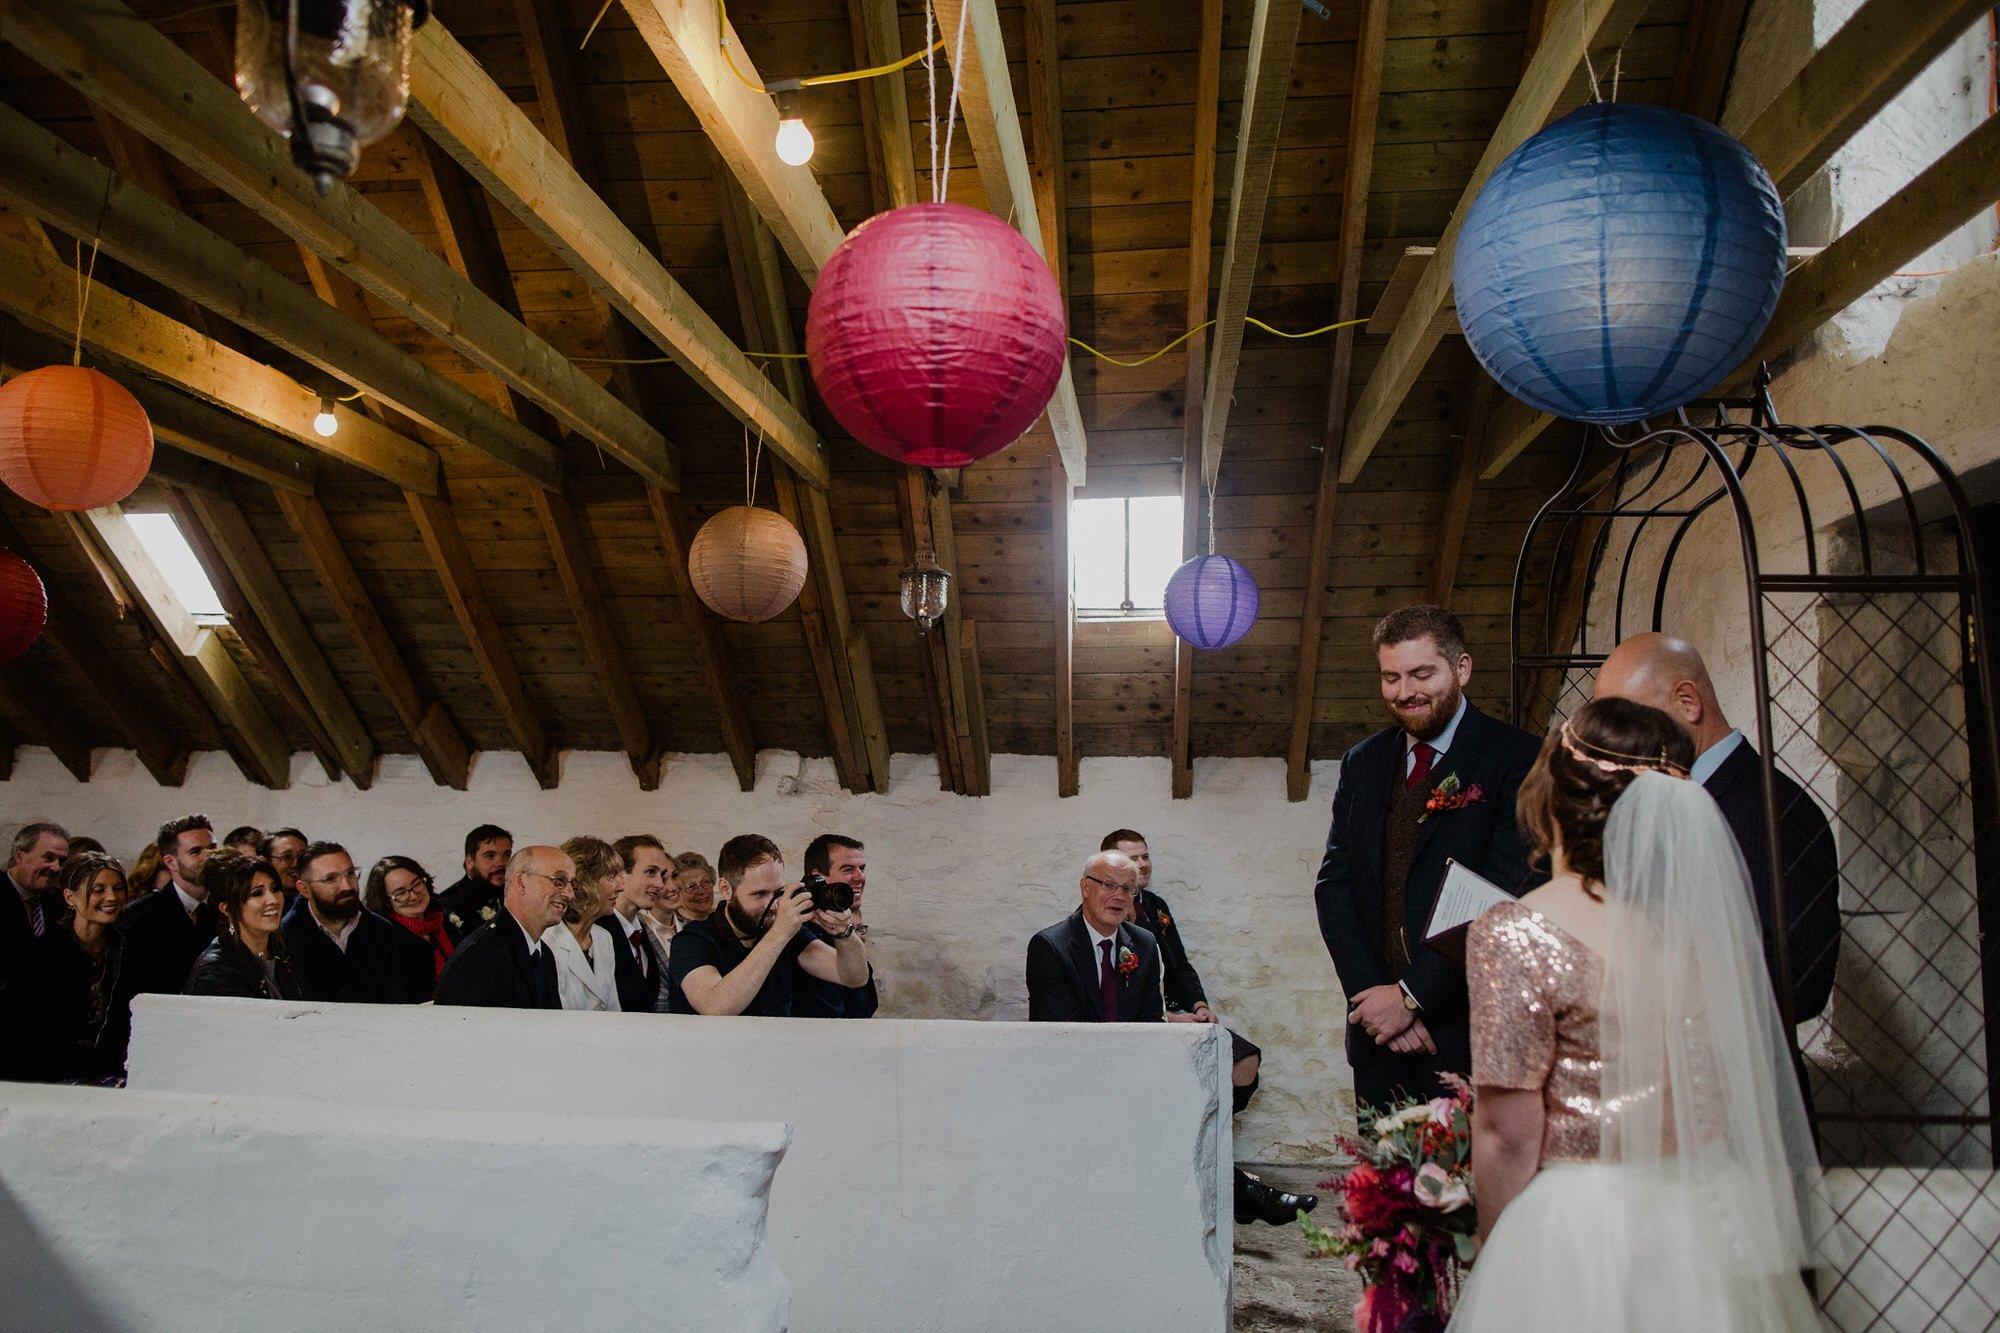 023 TIN SHED KNOCKRAICH FARM WEDDING ALTERNATIVE BRIDE ZOE ALEXANDRA PHOTOGRAPHY